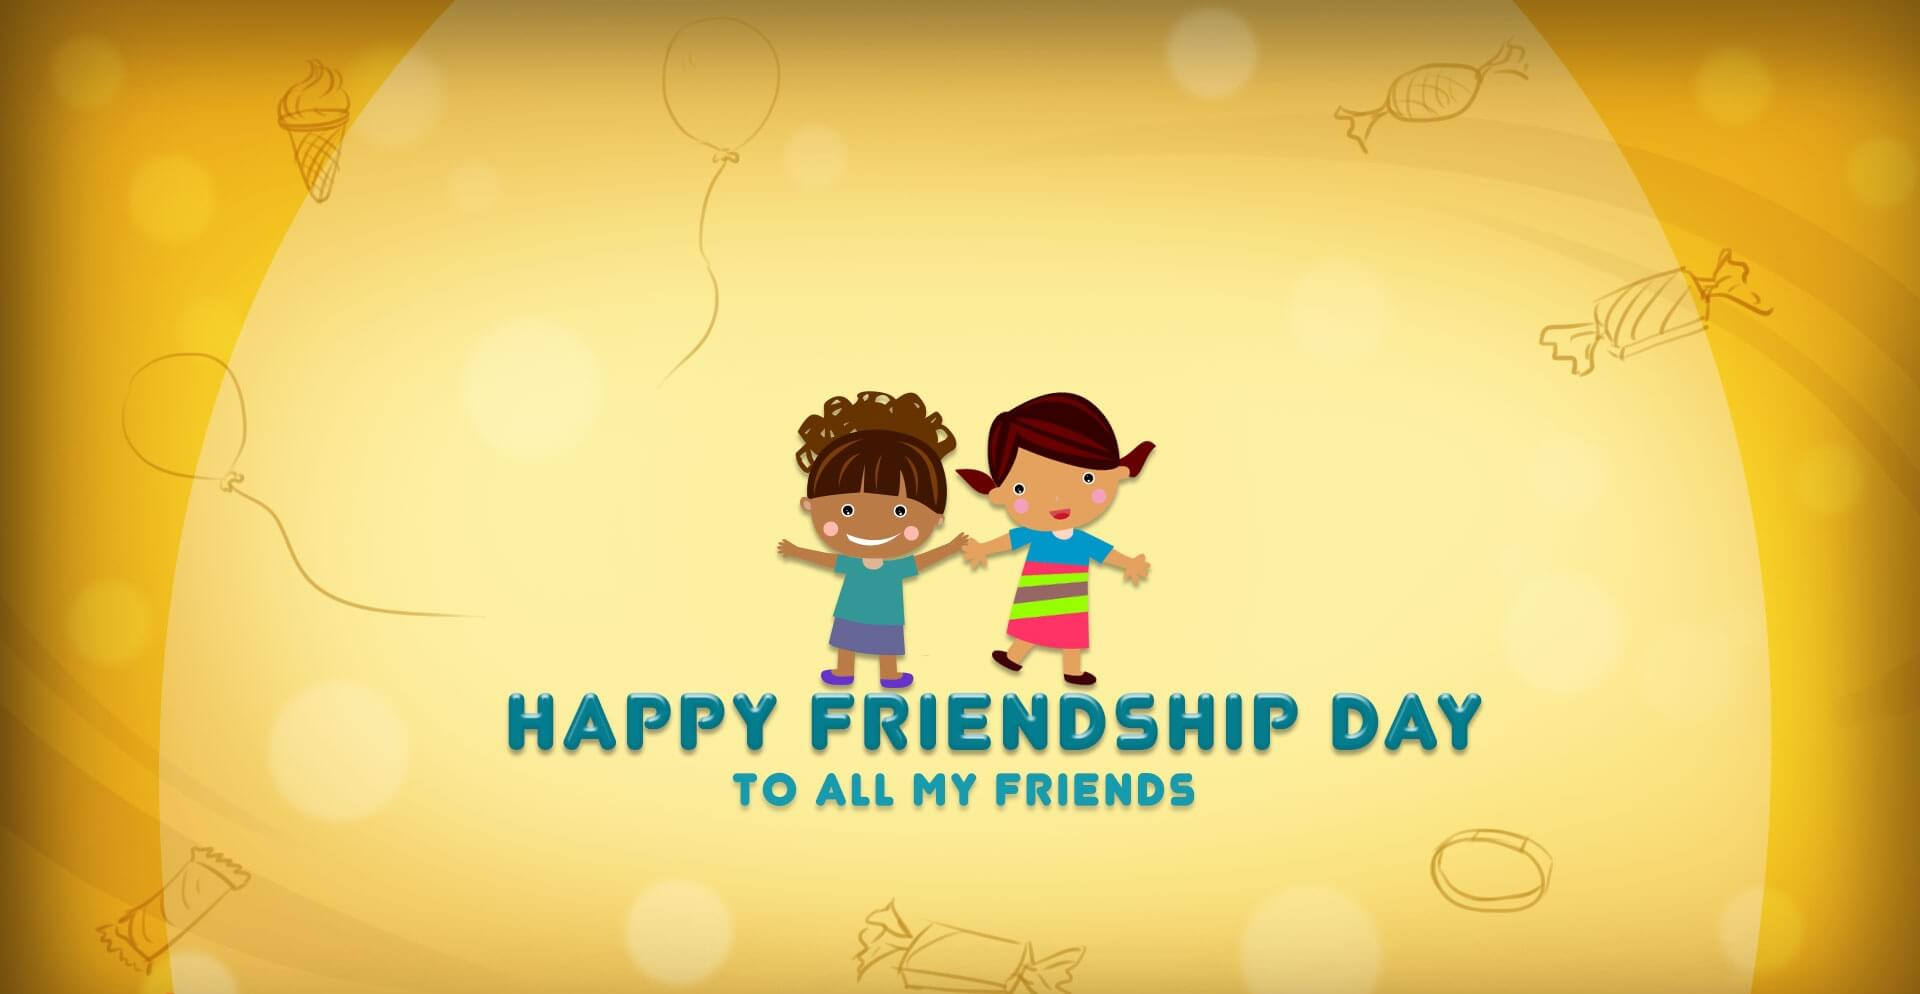 happy friendship day HD wallpaper for friends